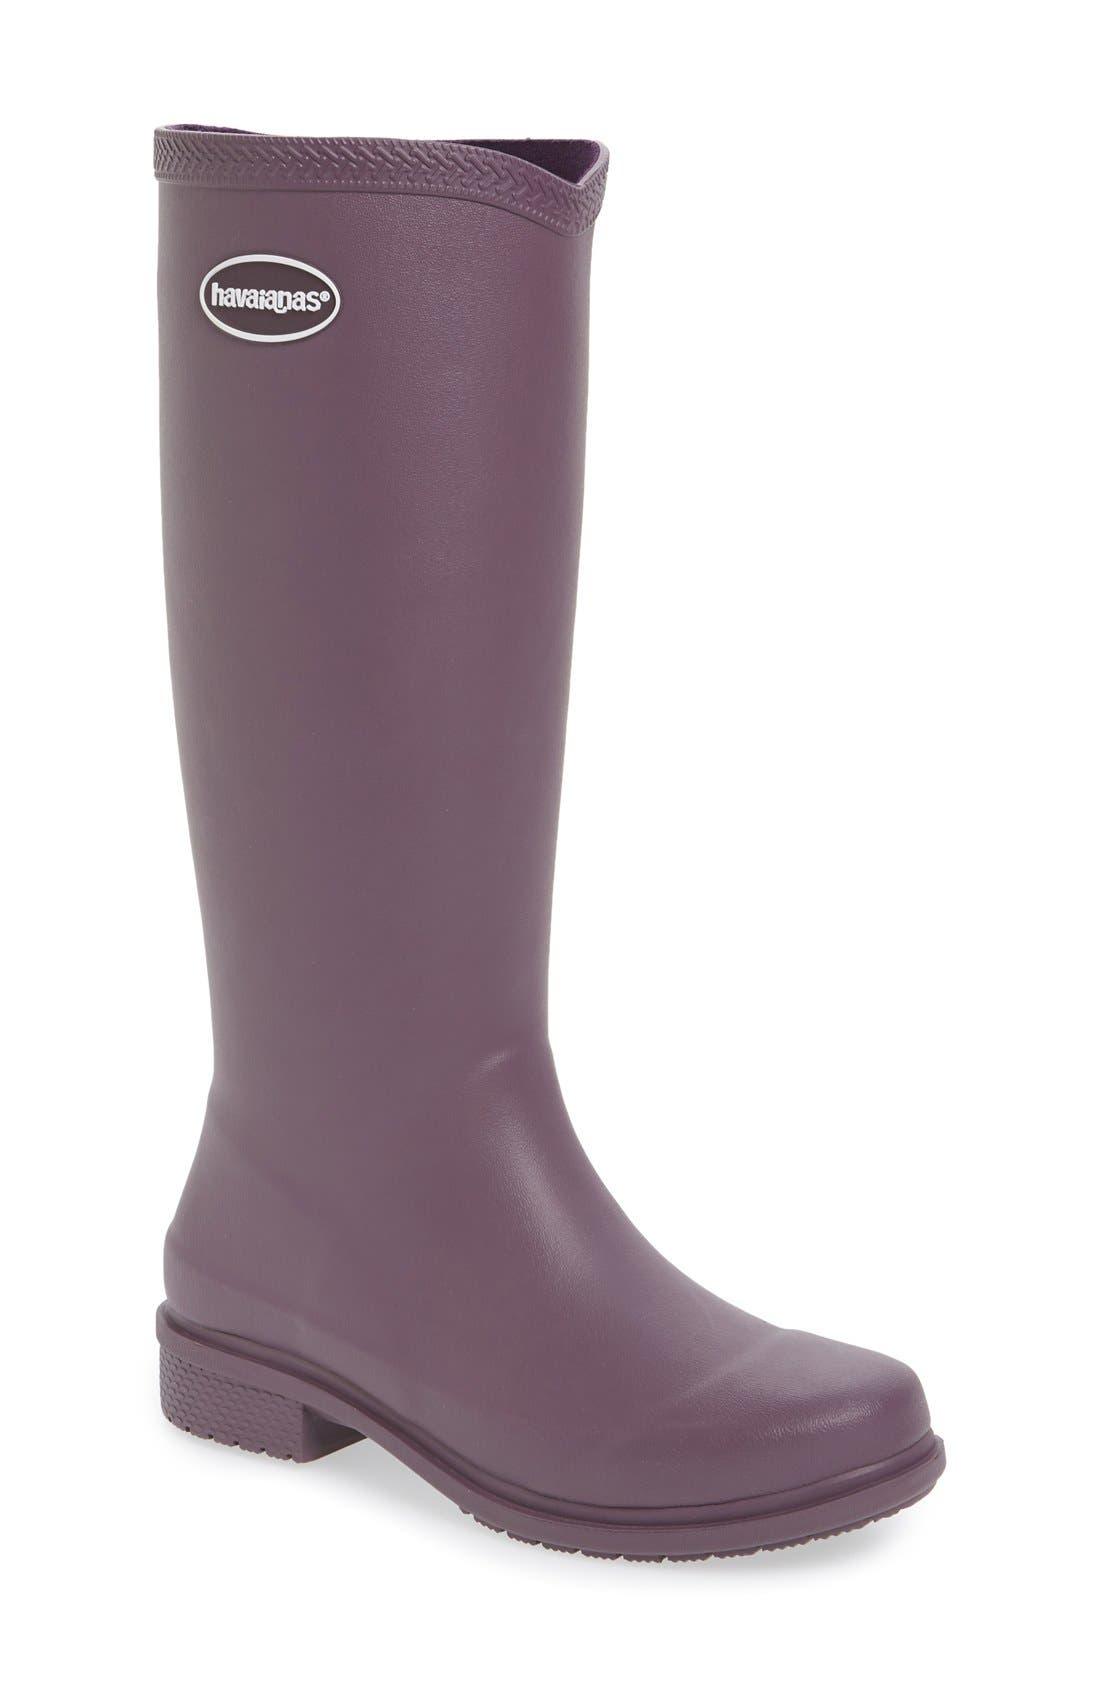 Main Image - Havaianas 'Galochas Hi Matte' Waterproof Rain Boot (Women) (Wide Calf)